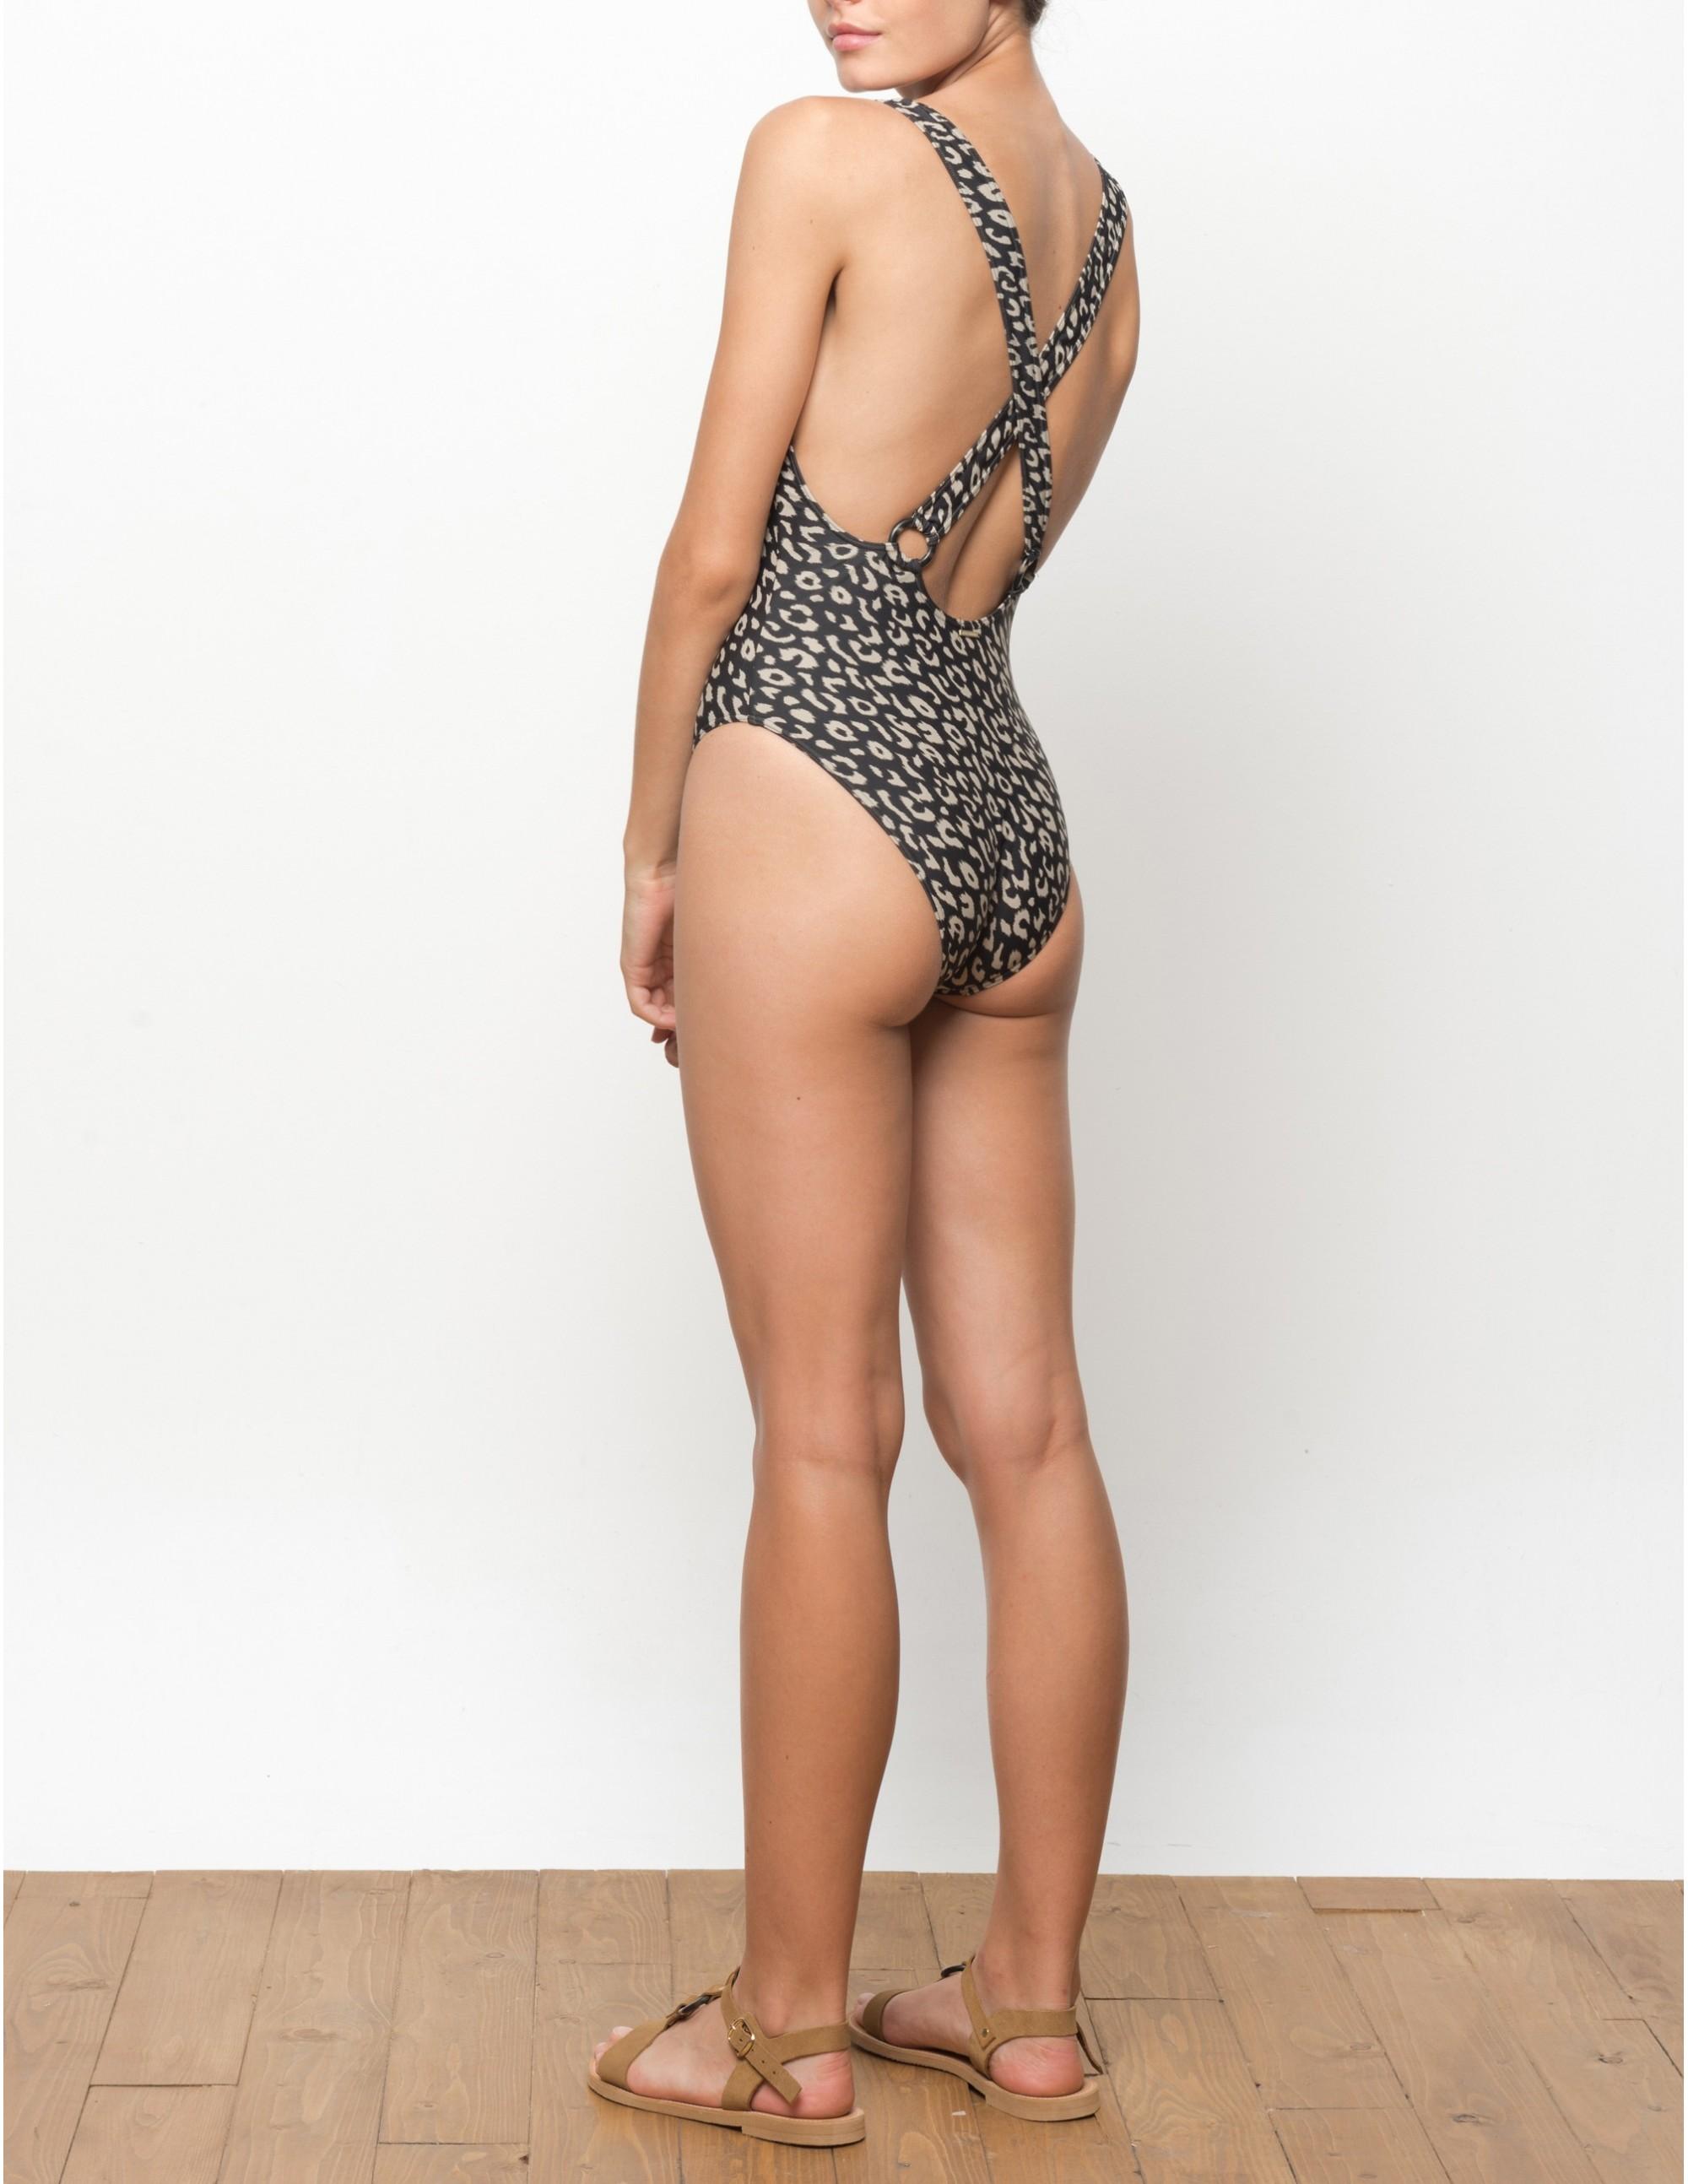 UROA swimsuit - LEOPARD